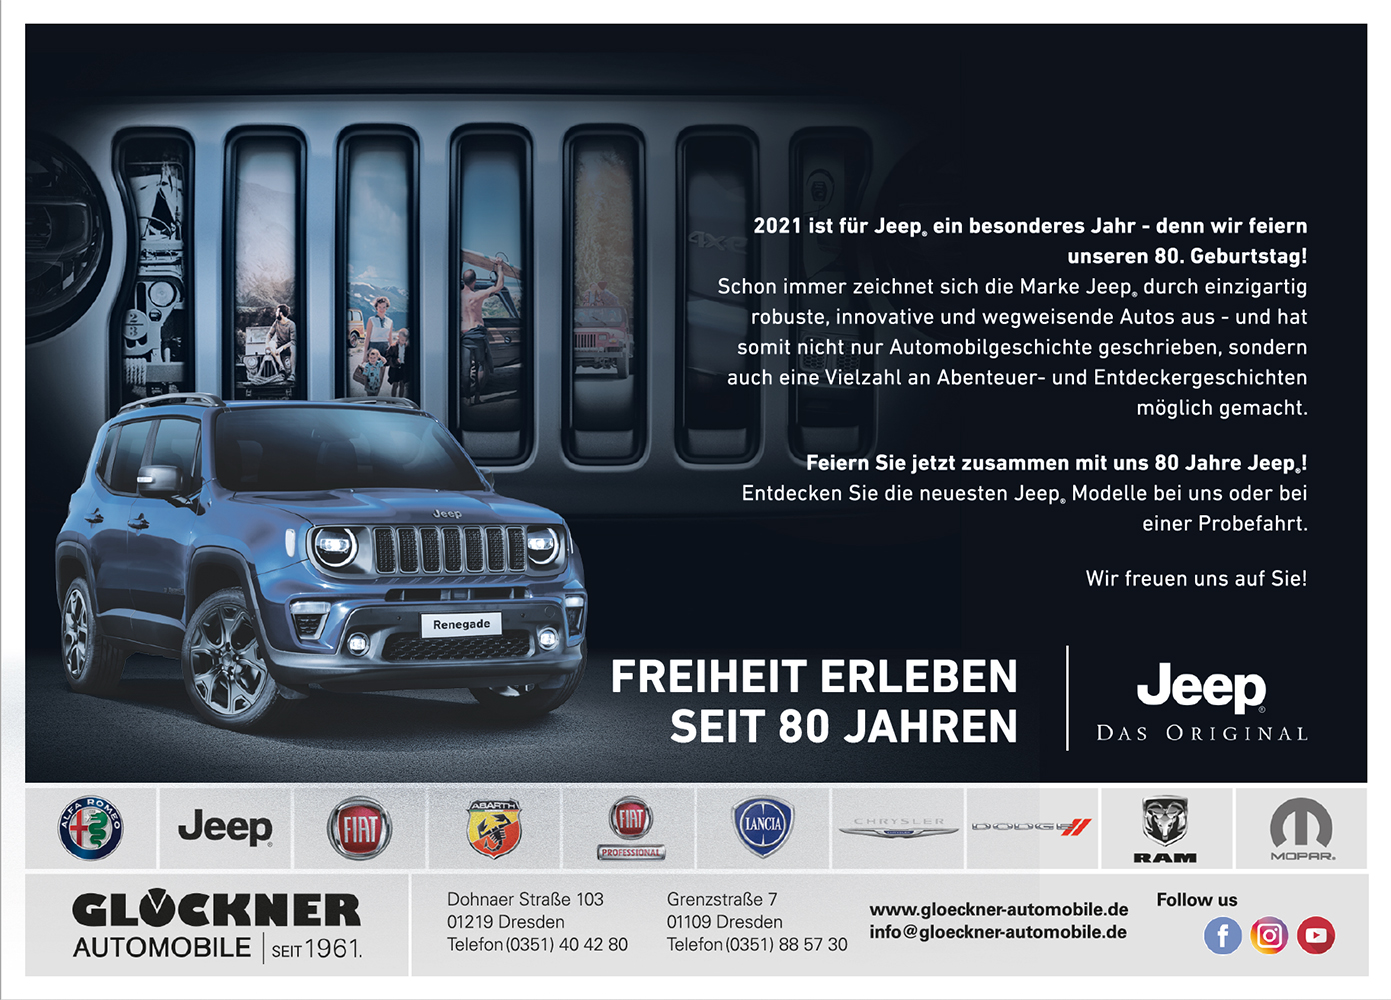 Glöckner Automobile